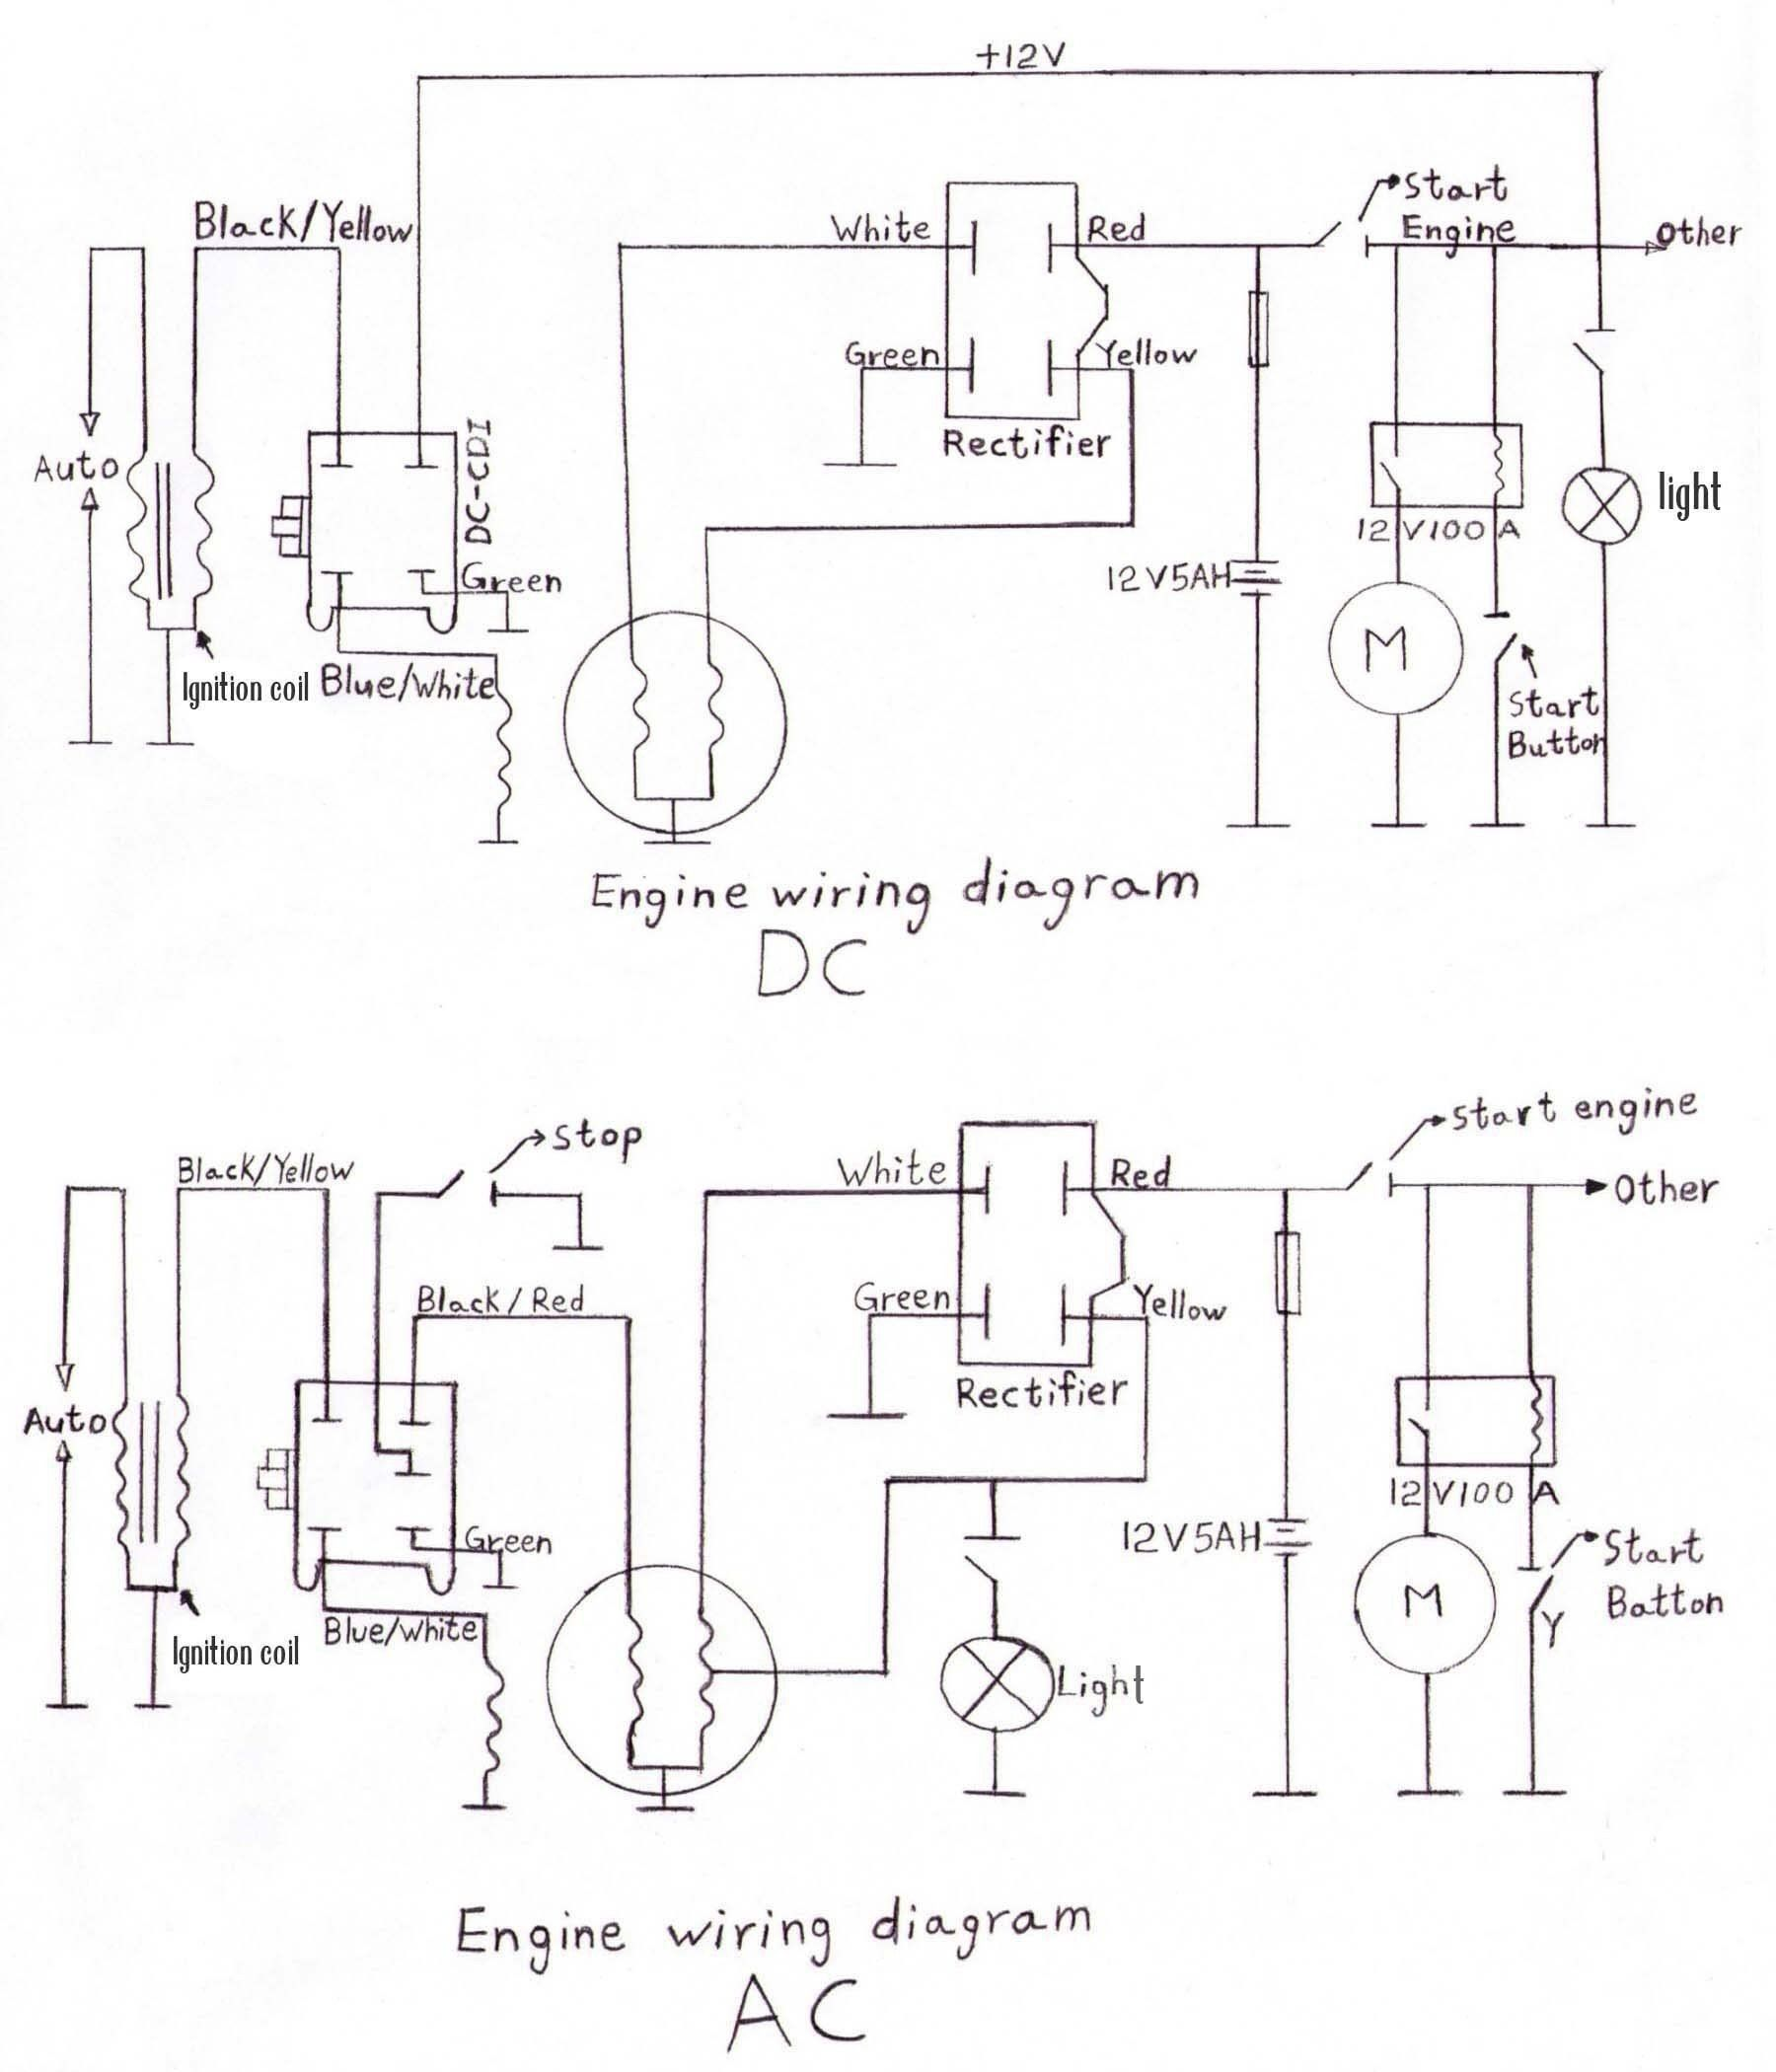 lifan generator wiring diagram inspirationa lifan 125cc wiring throughout lifan 125 wiring diagram [ 1800 x 2100 Pixel ]